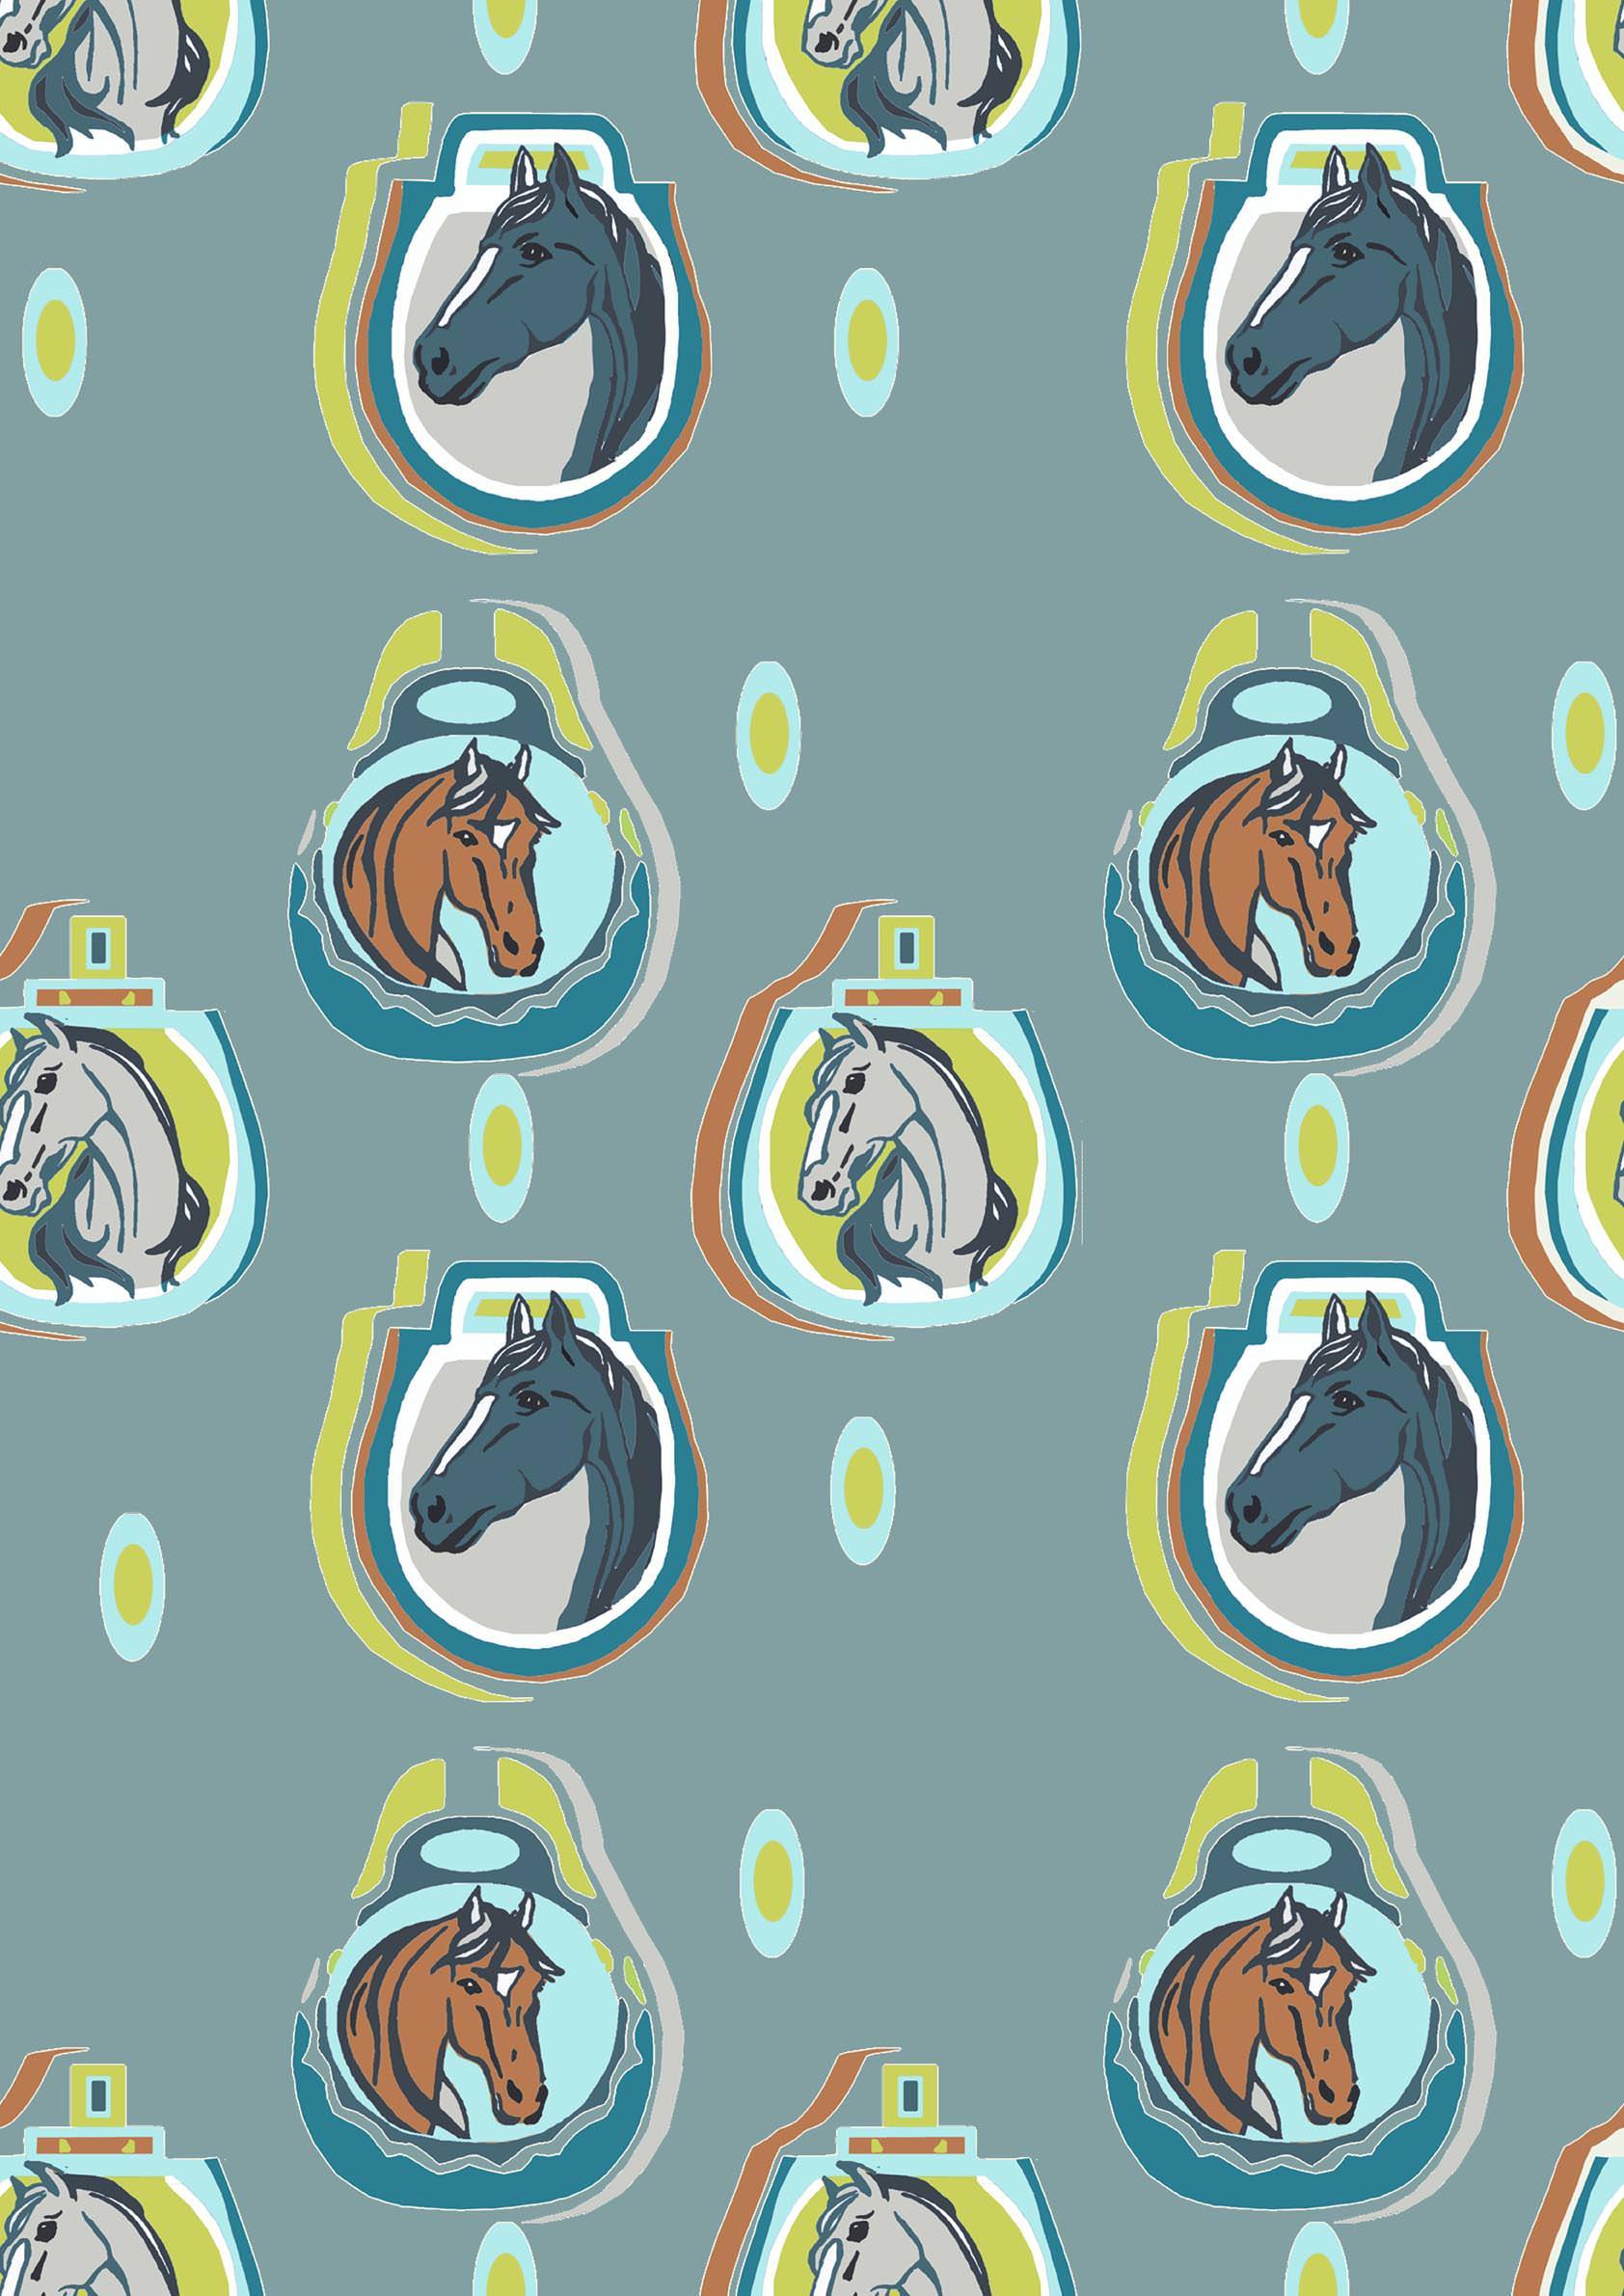 retro horses design teal.jpg